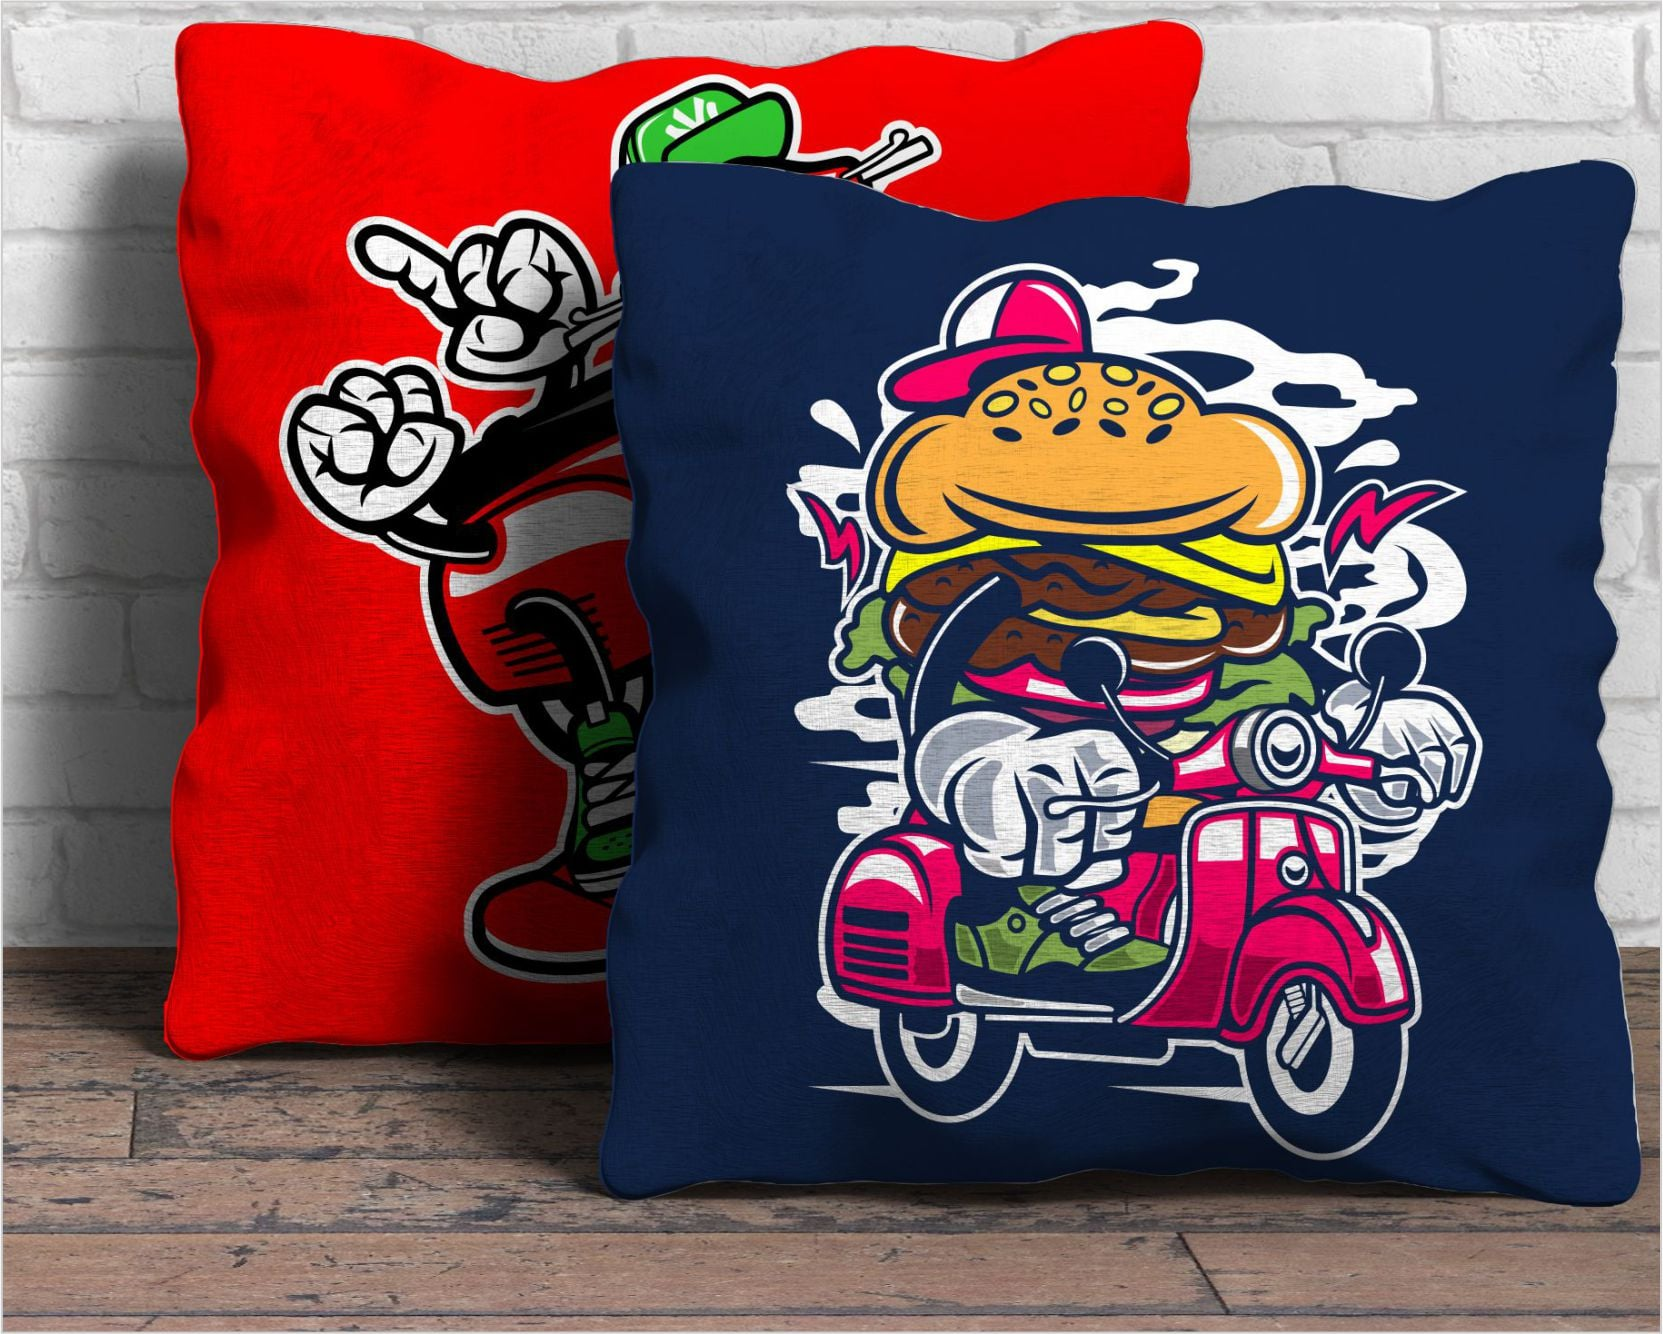 Modern cartoon illustrations on the pillows.